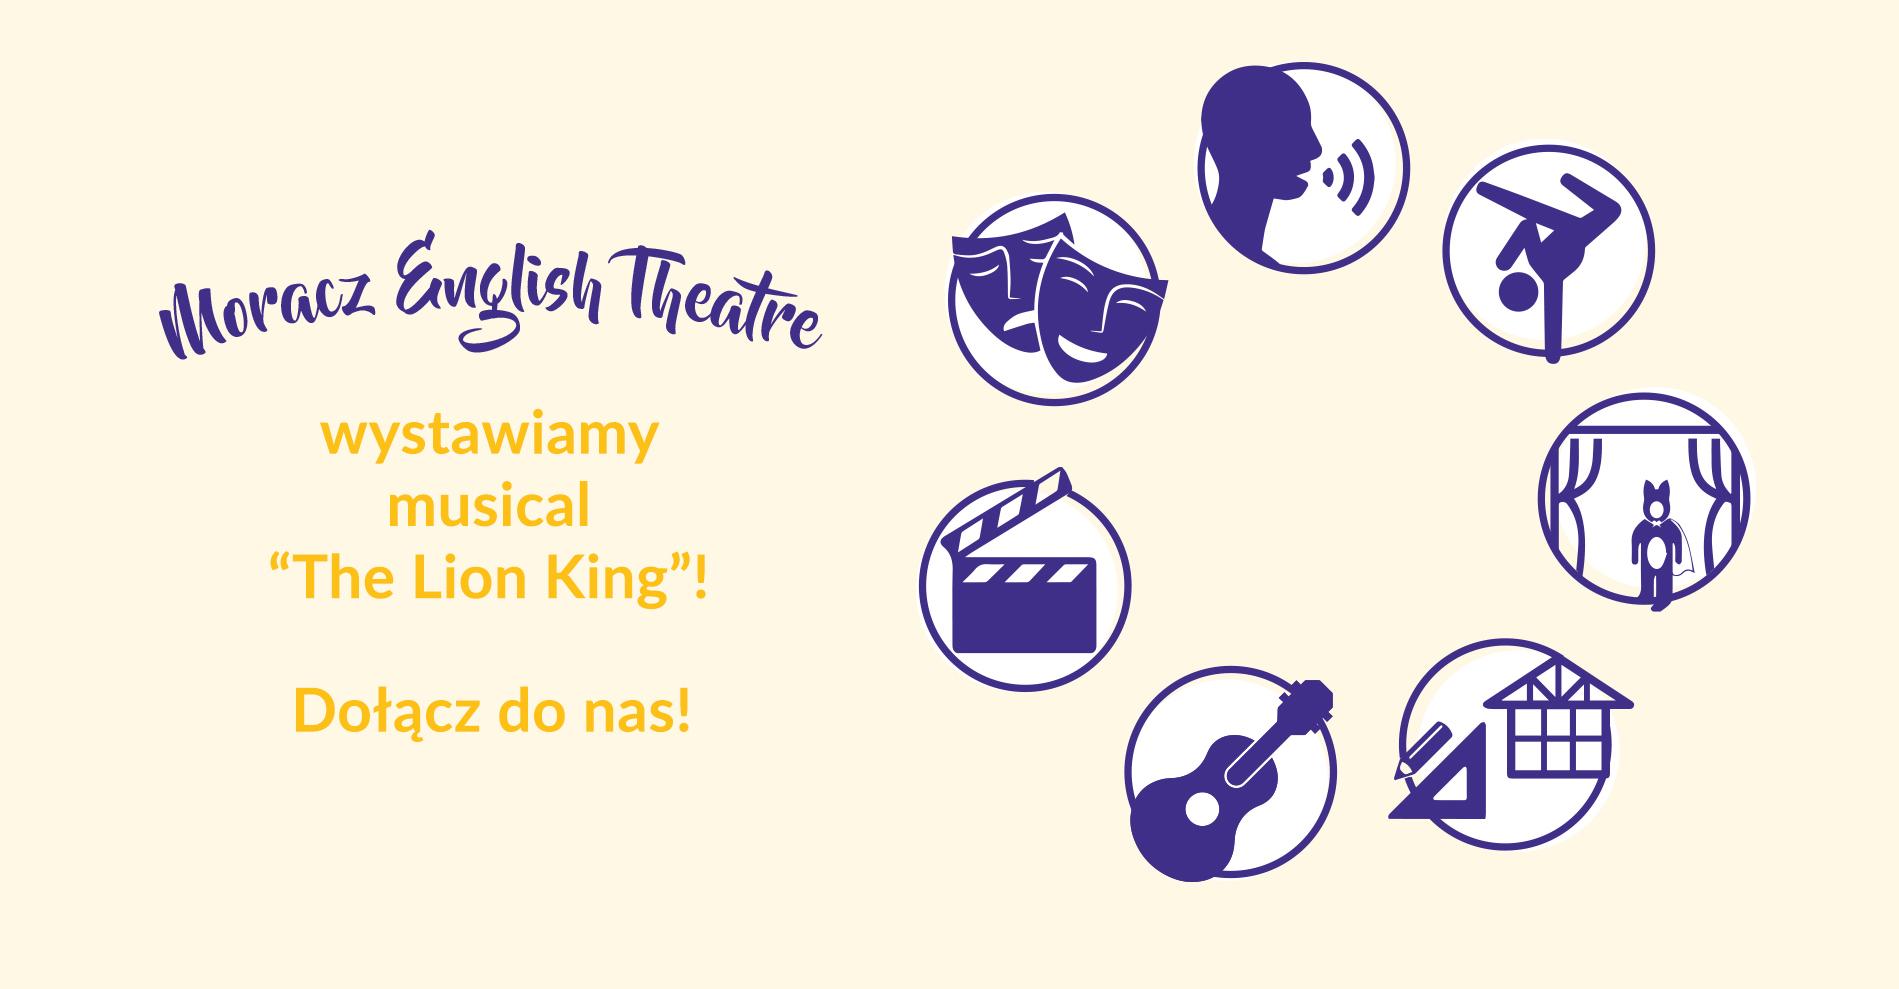 Moracz English Theatre – zapisy na warsztaty!